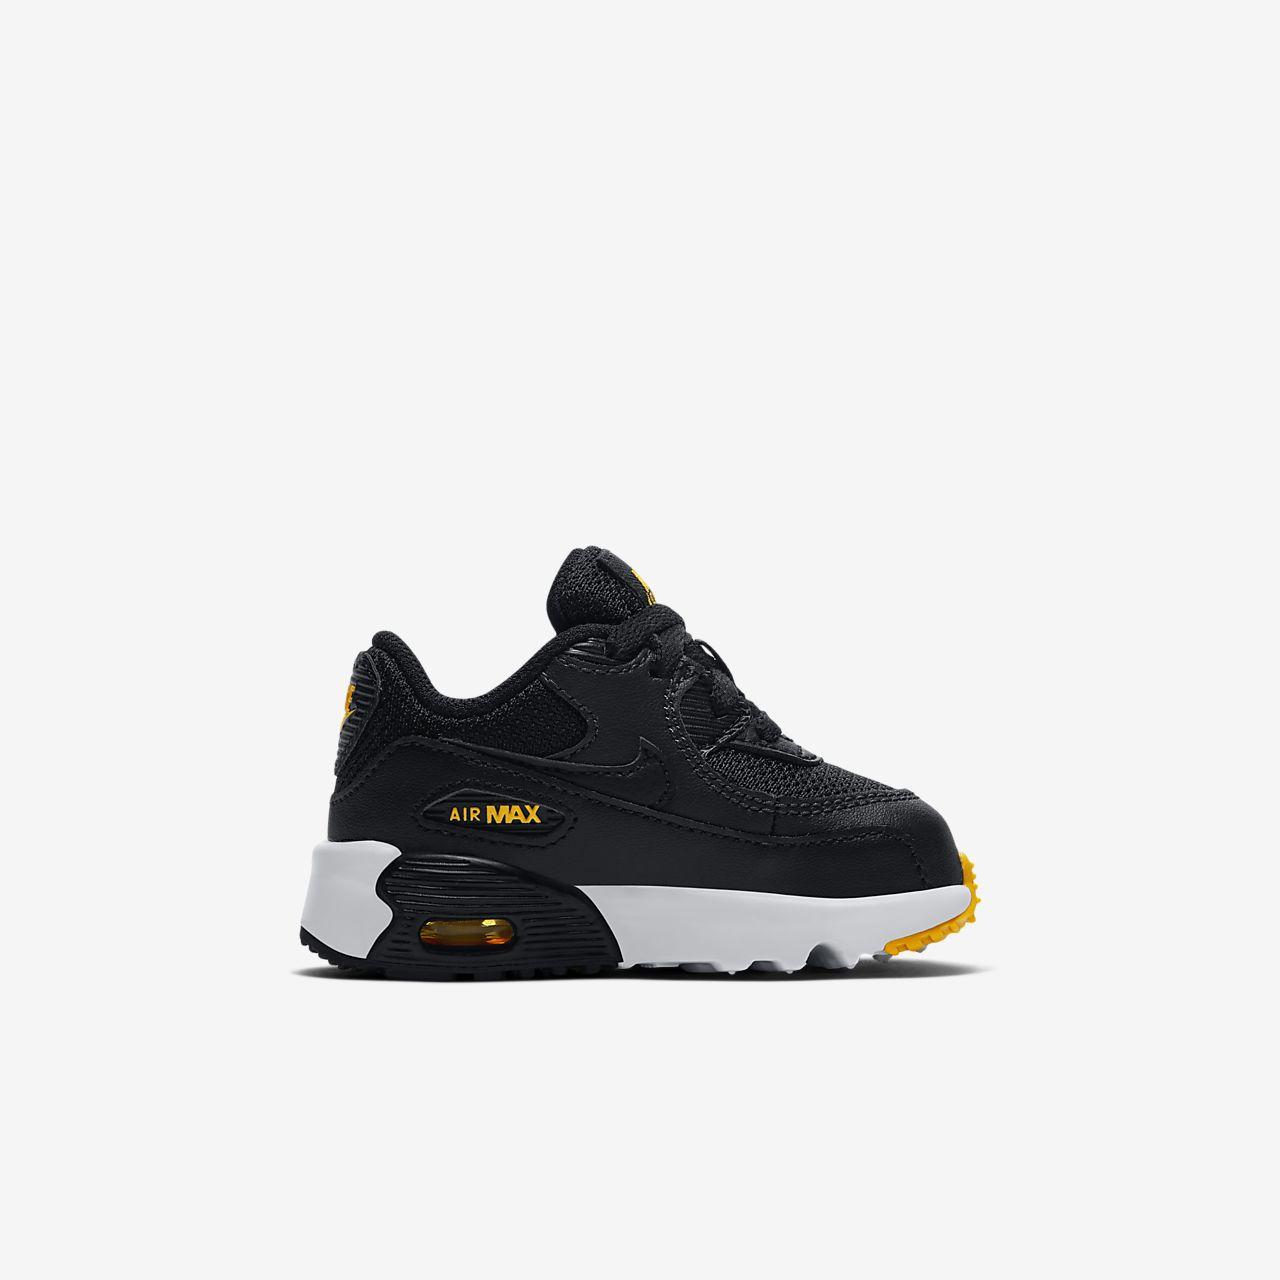 49fdc6d453ea1 Scarpa Nike Air Max 90 Mesh - Neonati Bimbi piccoli (17-27). Nike.com IT